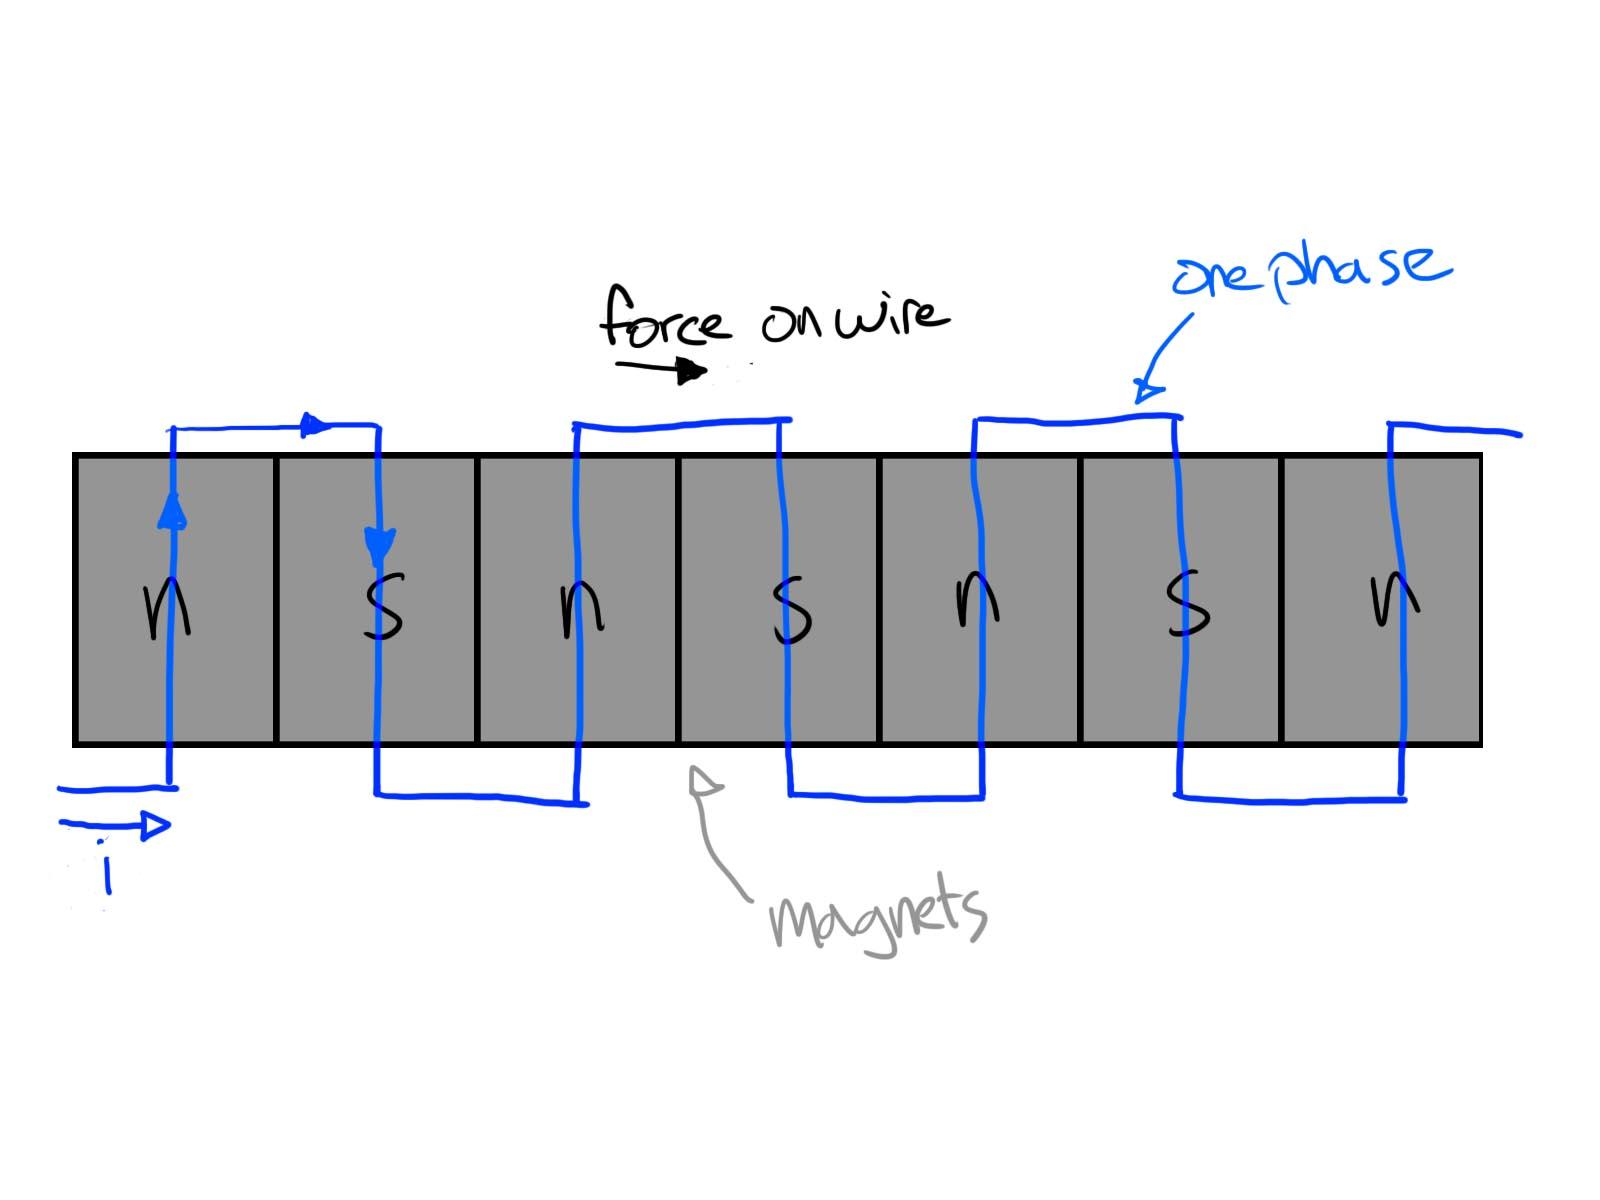 Exelent Three Phase Motor Winding Diagram Mold - Wiring Diagram ...